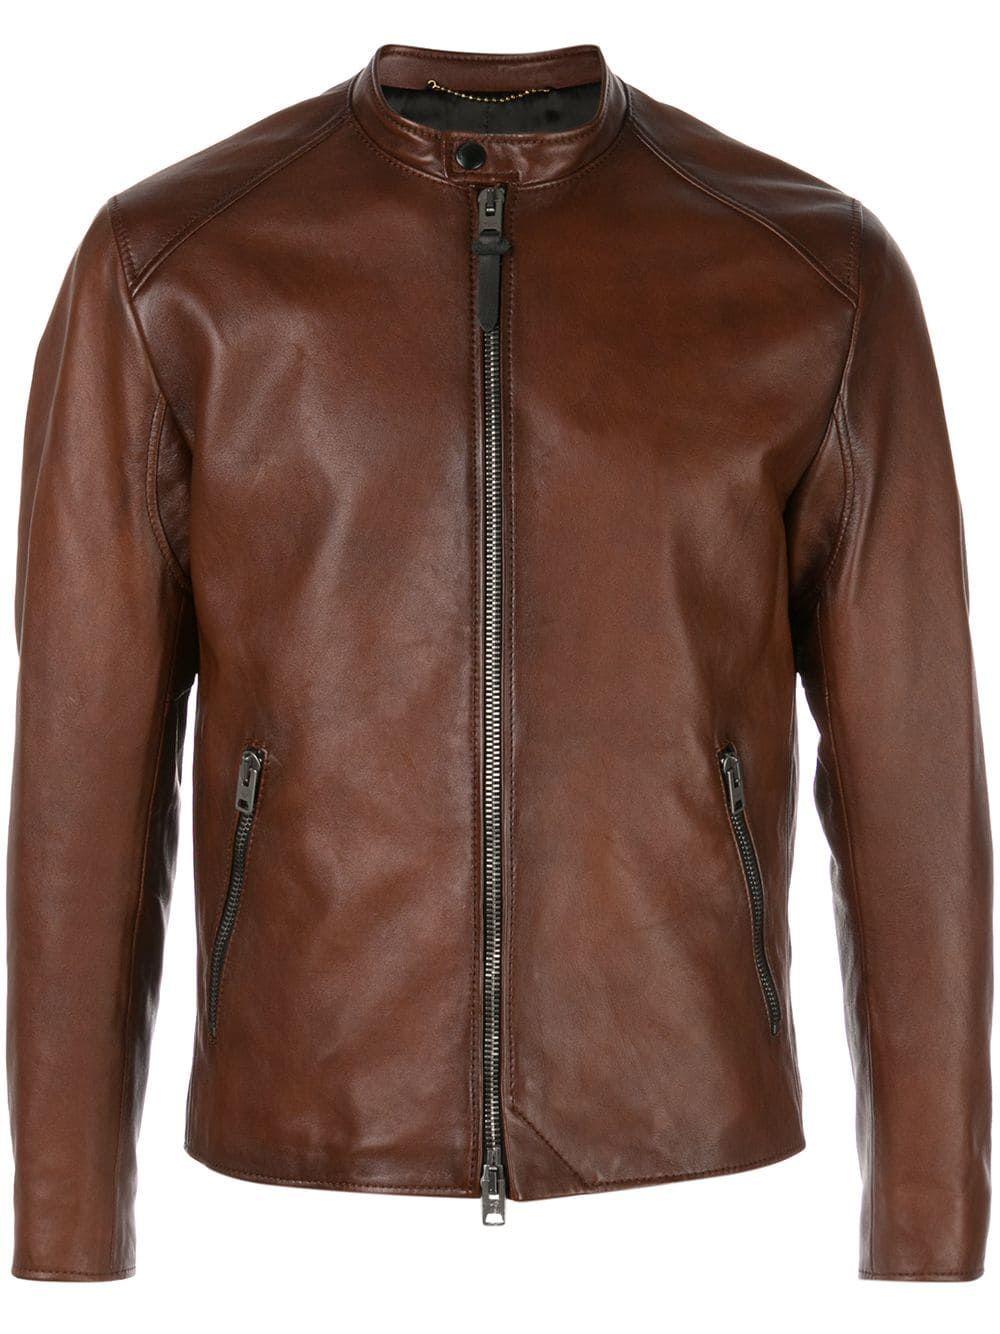 Coach Icon Racer Jacket In Brown Modesens Leather Jacket Style Racer Jacket Designer Leather Jackets [ 1334 x 1000 Pixel ]